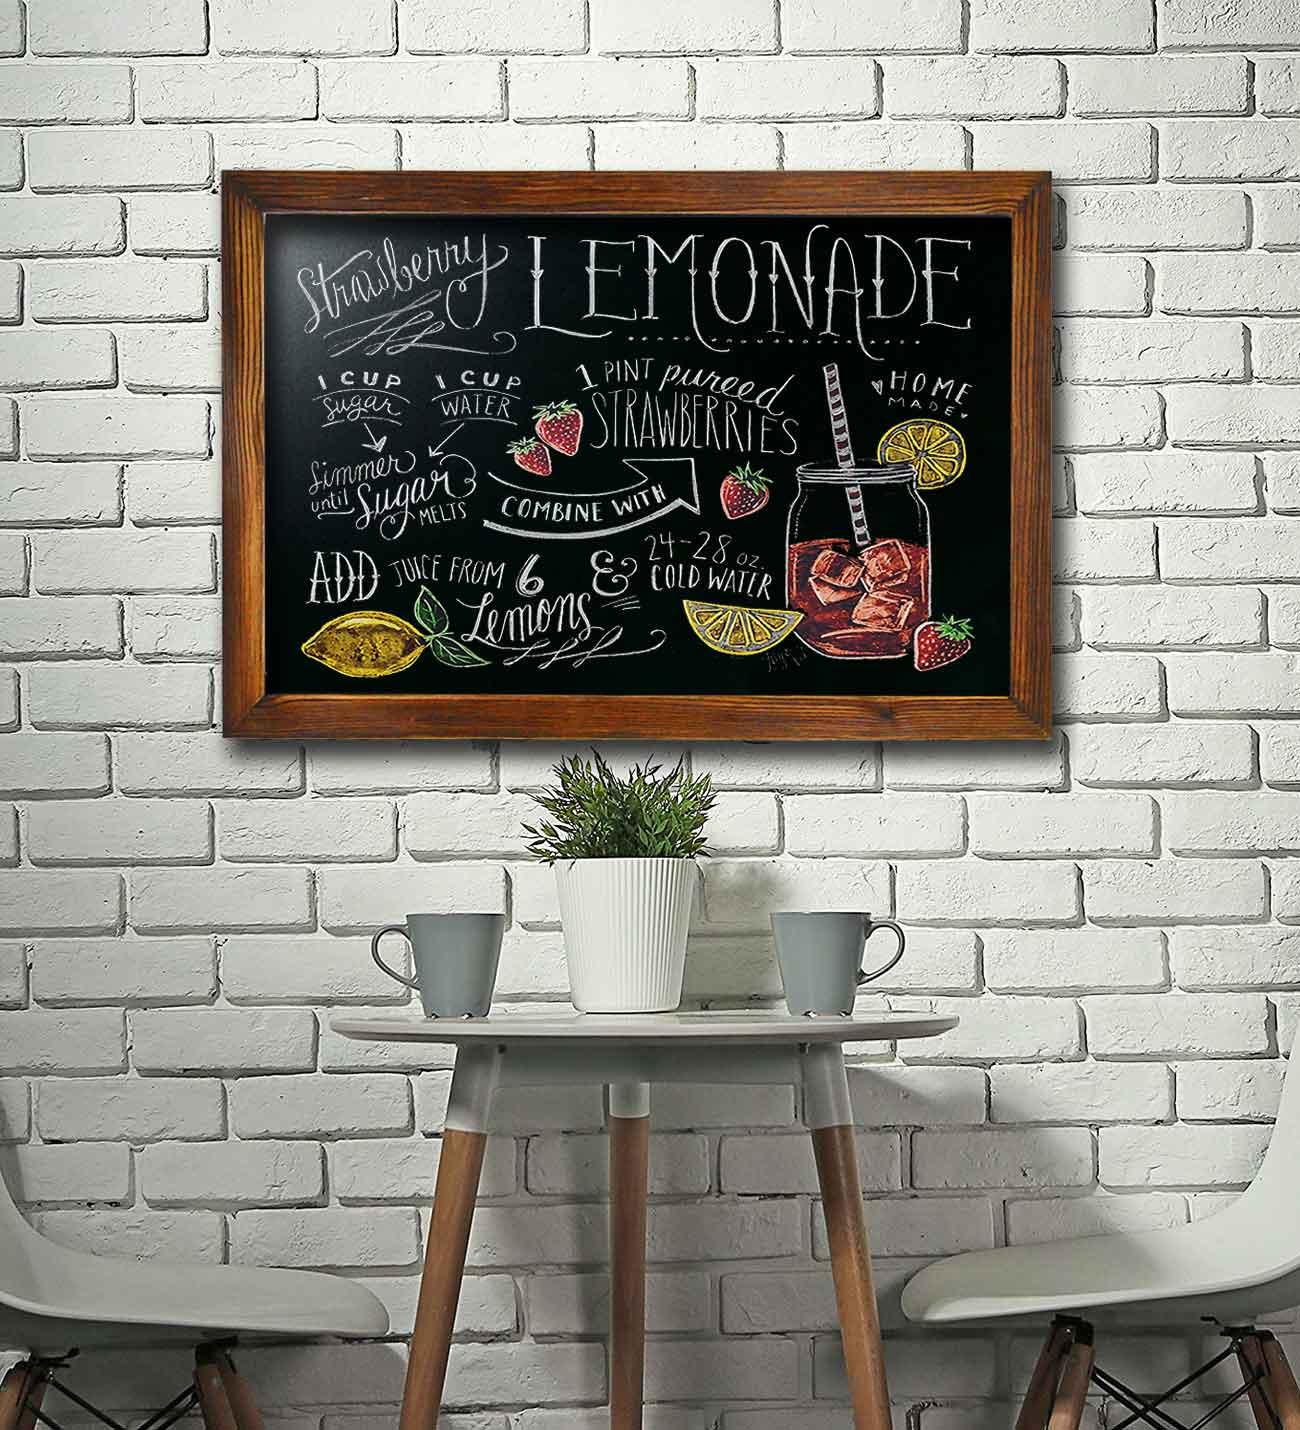 Best Quality Chalkboard For Wall Dry Erase Writing Board Great Decor Home Office Bar Restaurant Buy Kitchen Decor Restaurant Menu Wood Frame Magnetic Chalkboard Whiteboard Blackboard Easel Sign Framed Chalkboard Vintage